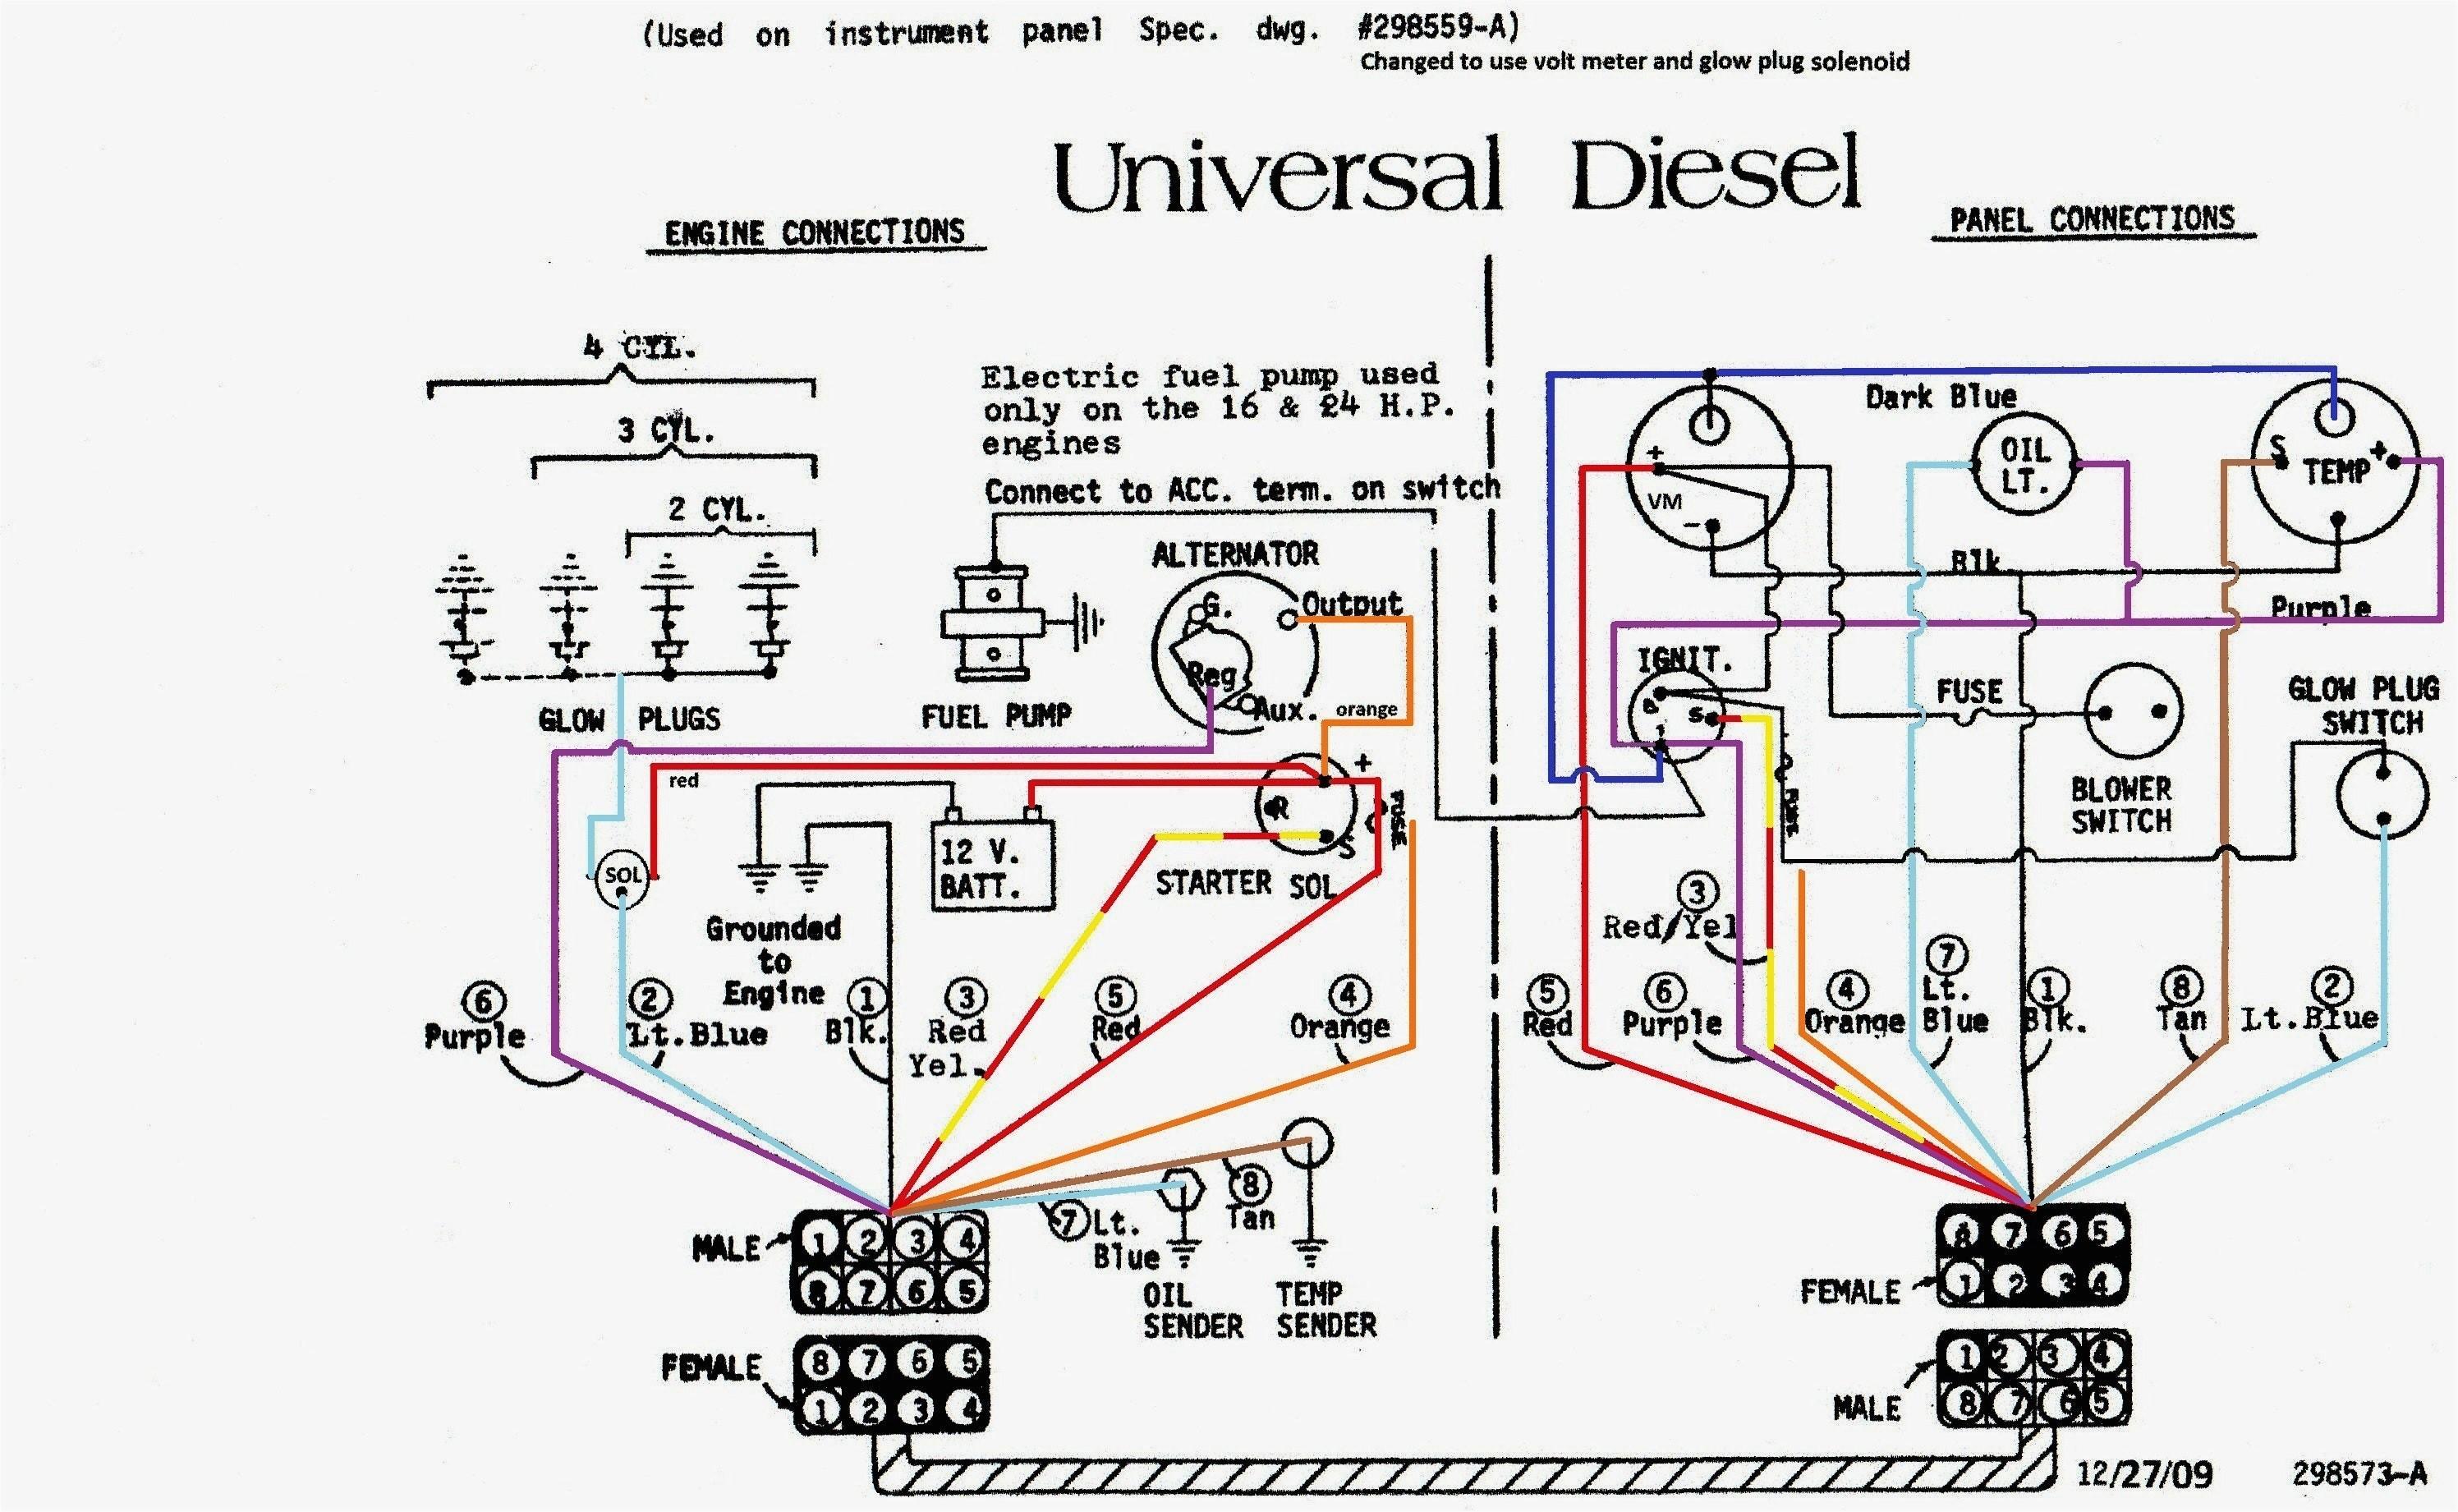 Blazer Led Trailer Lights Wiring Diagram – Architecture Diagram - Blazer Trailer Lights Wiring Diagram